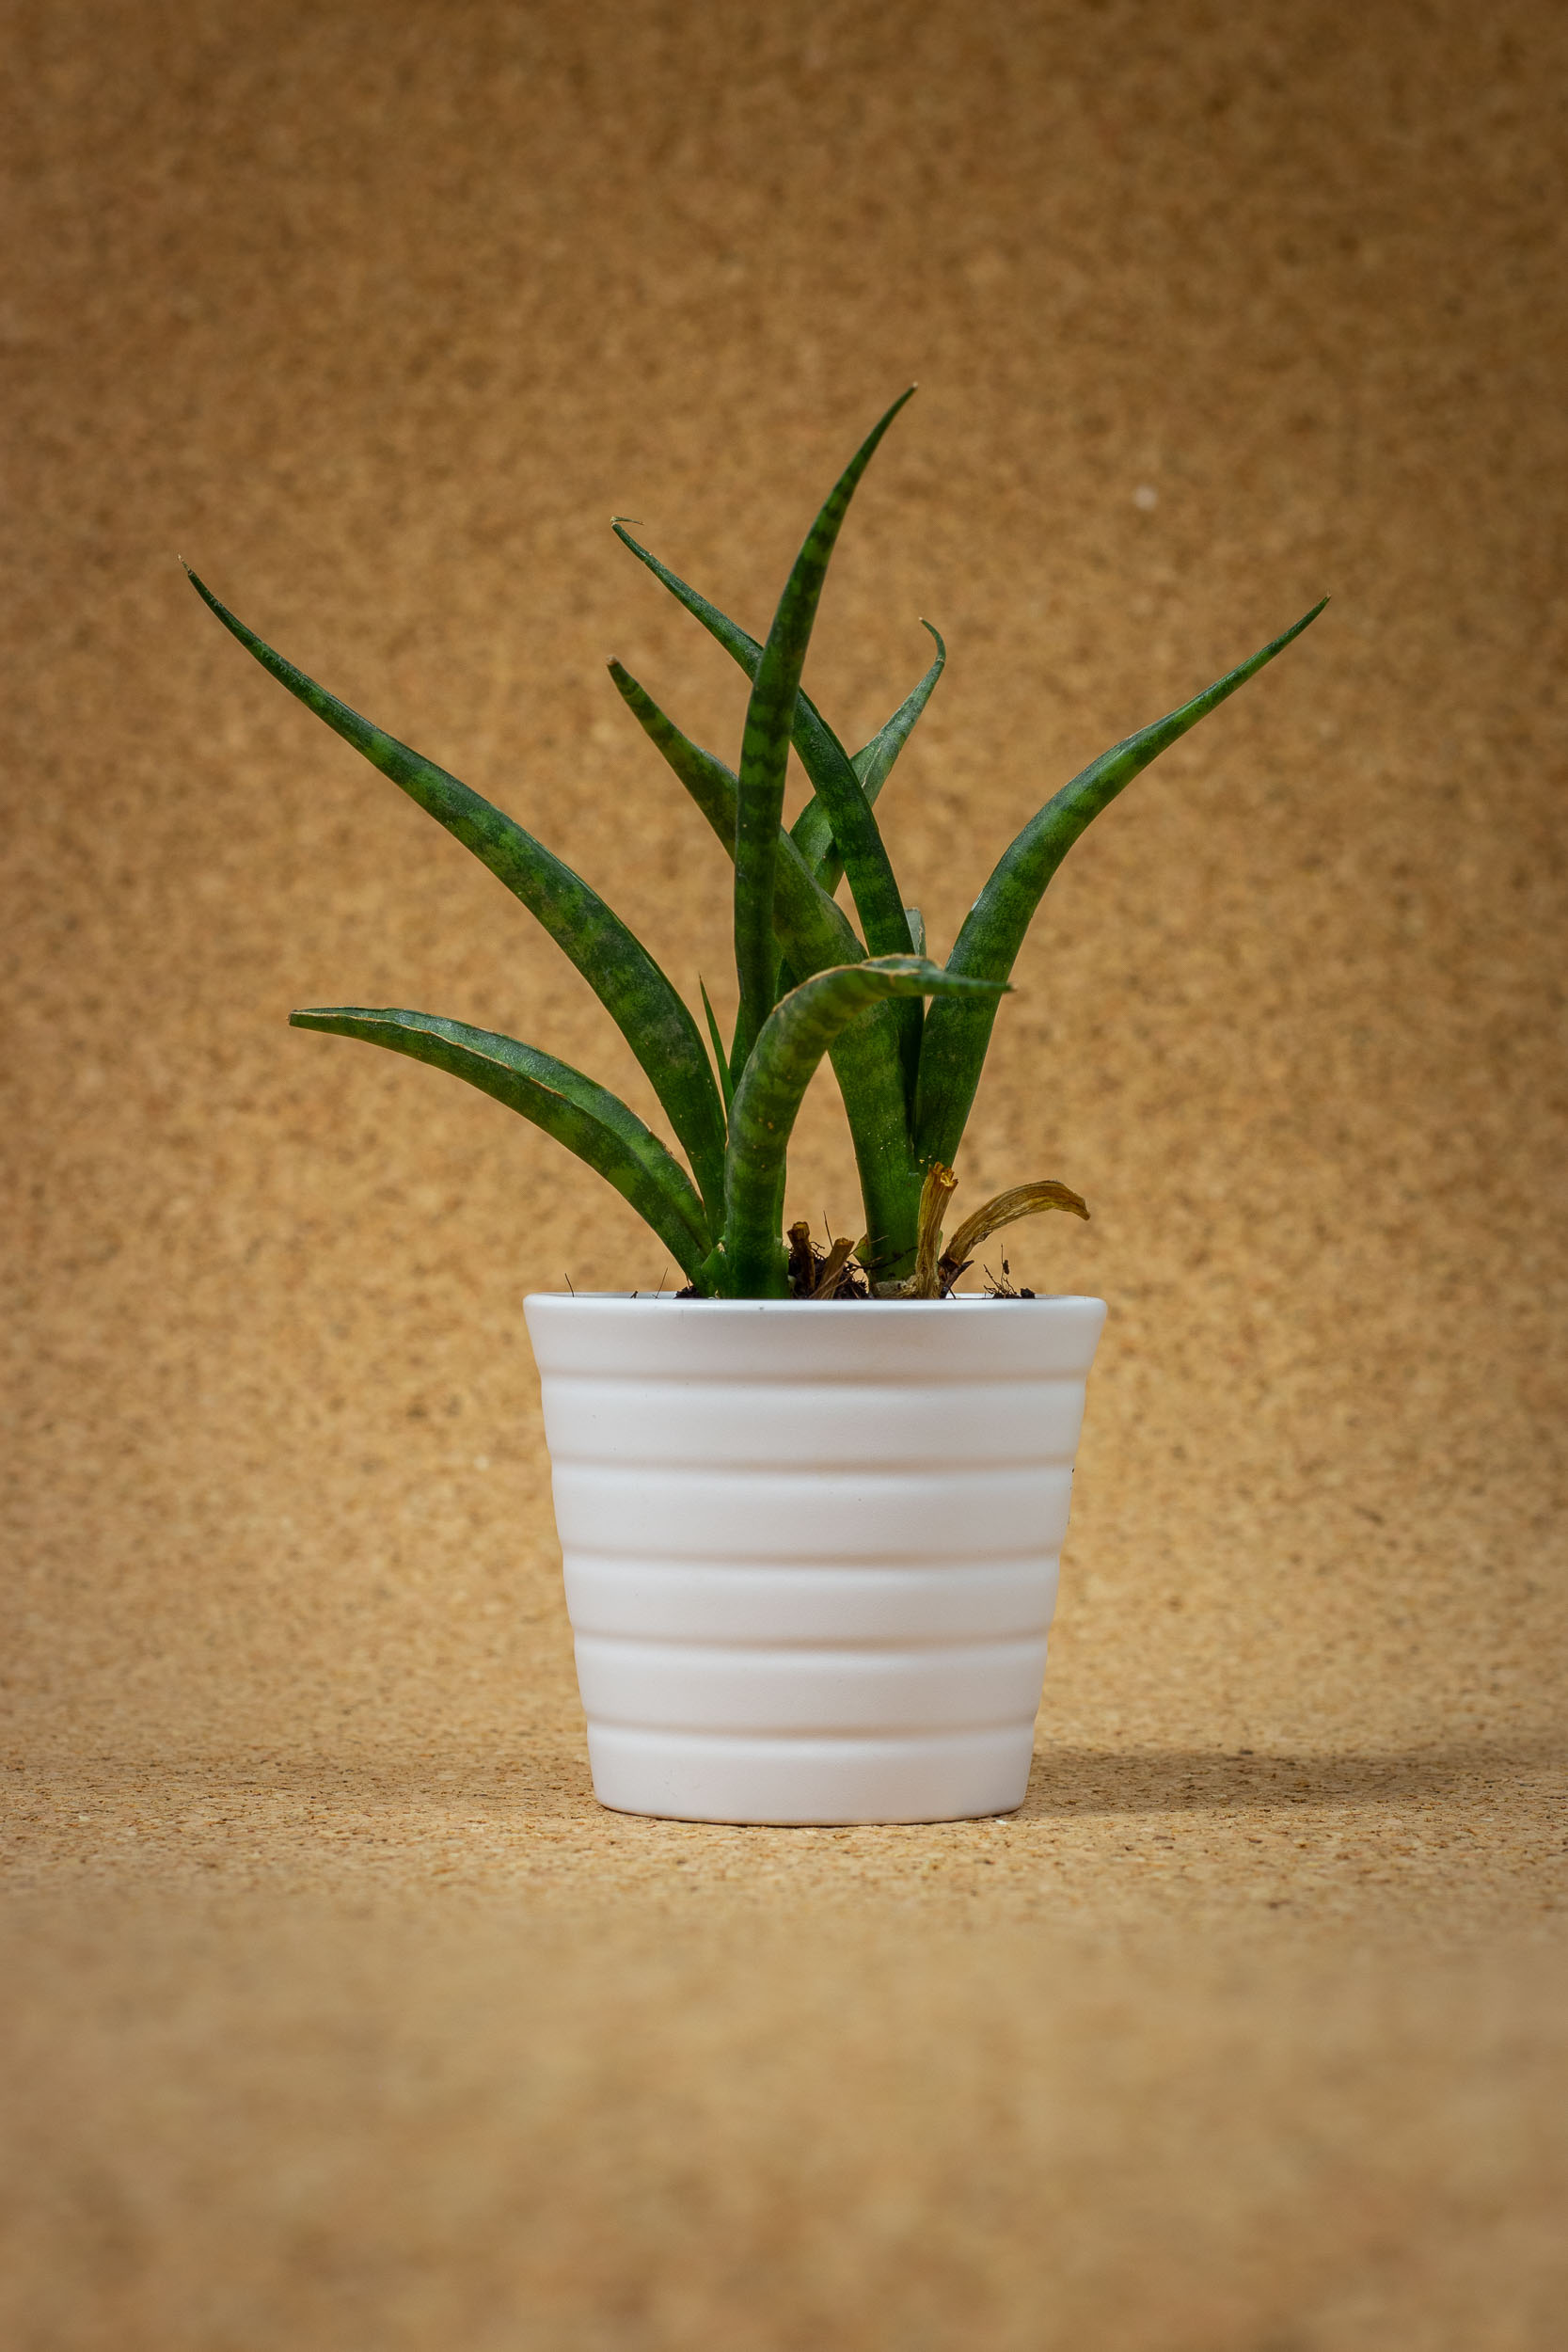 plante-photographe-besançon-gui2raw